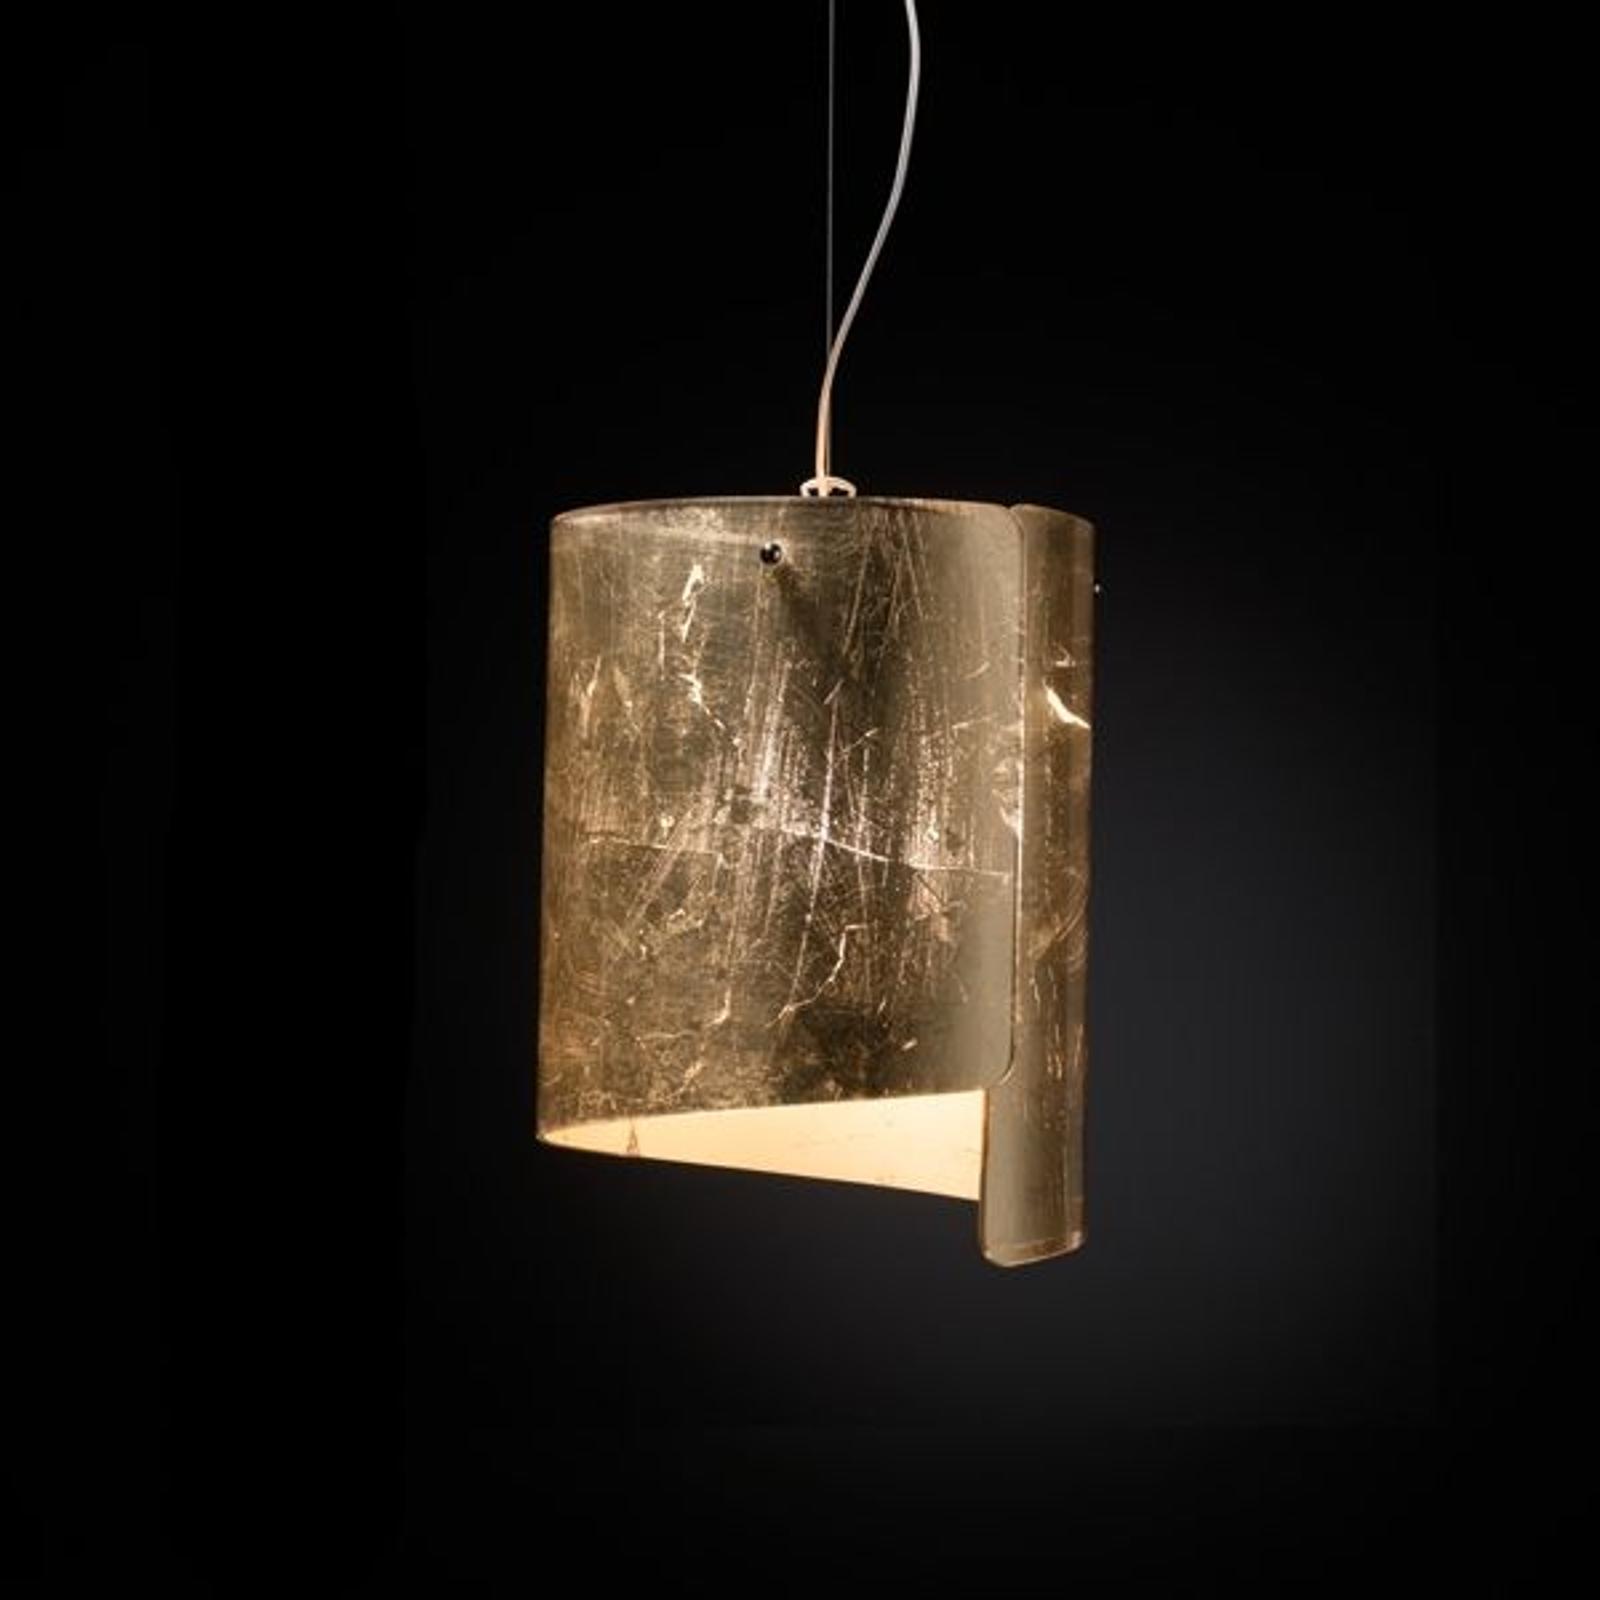 Mooi gevormde hanglamp Papiro diameter 26 cm, goud